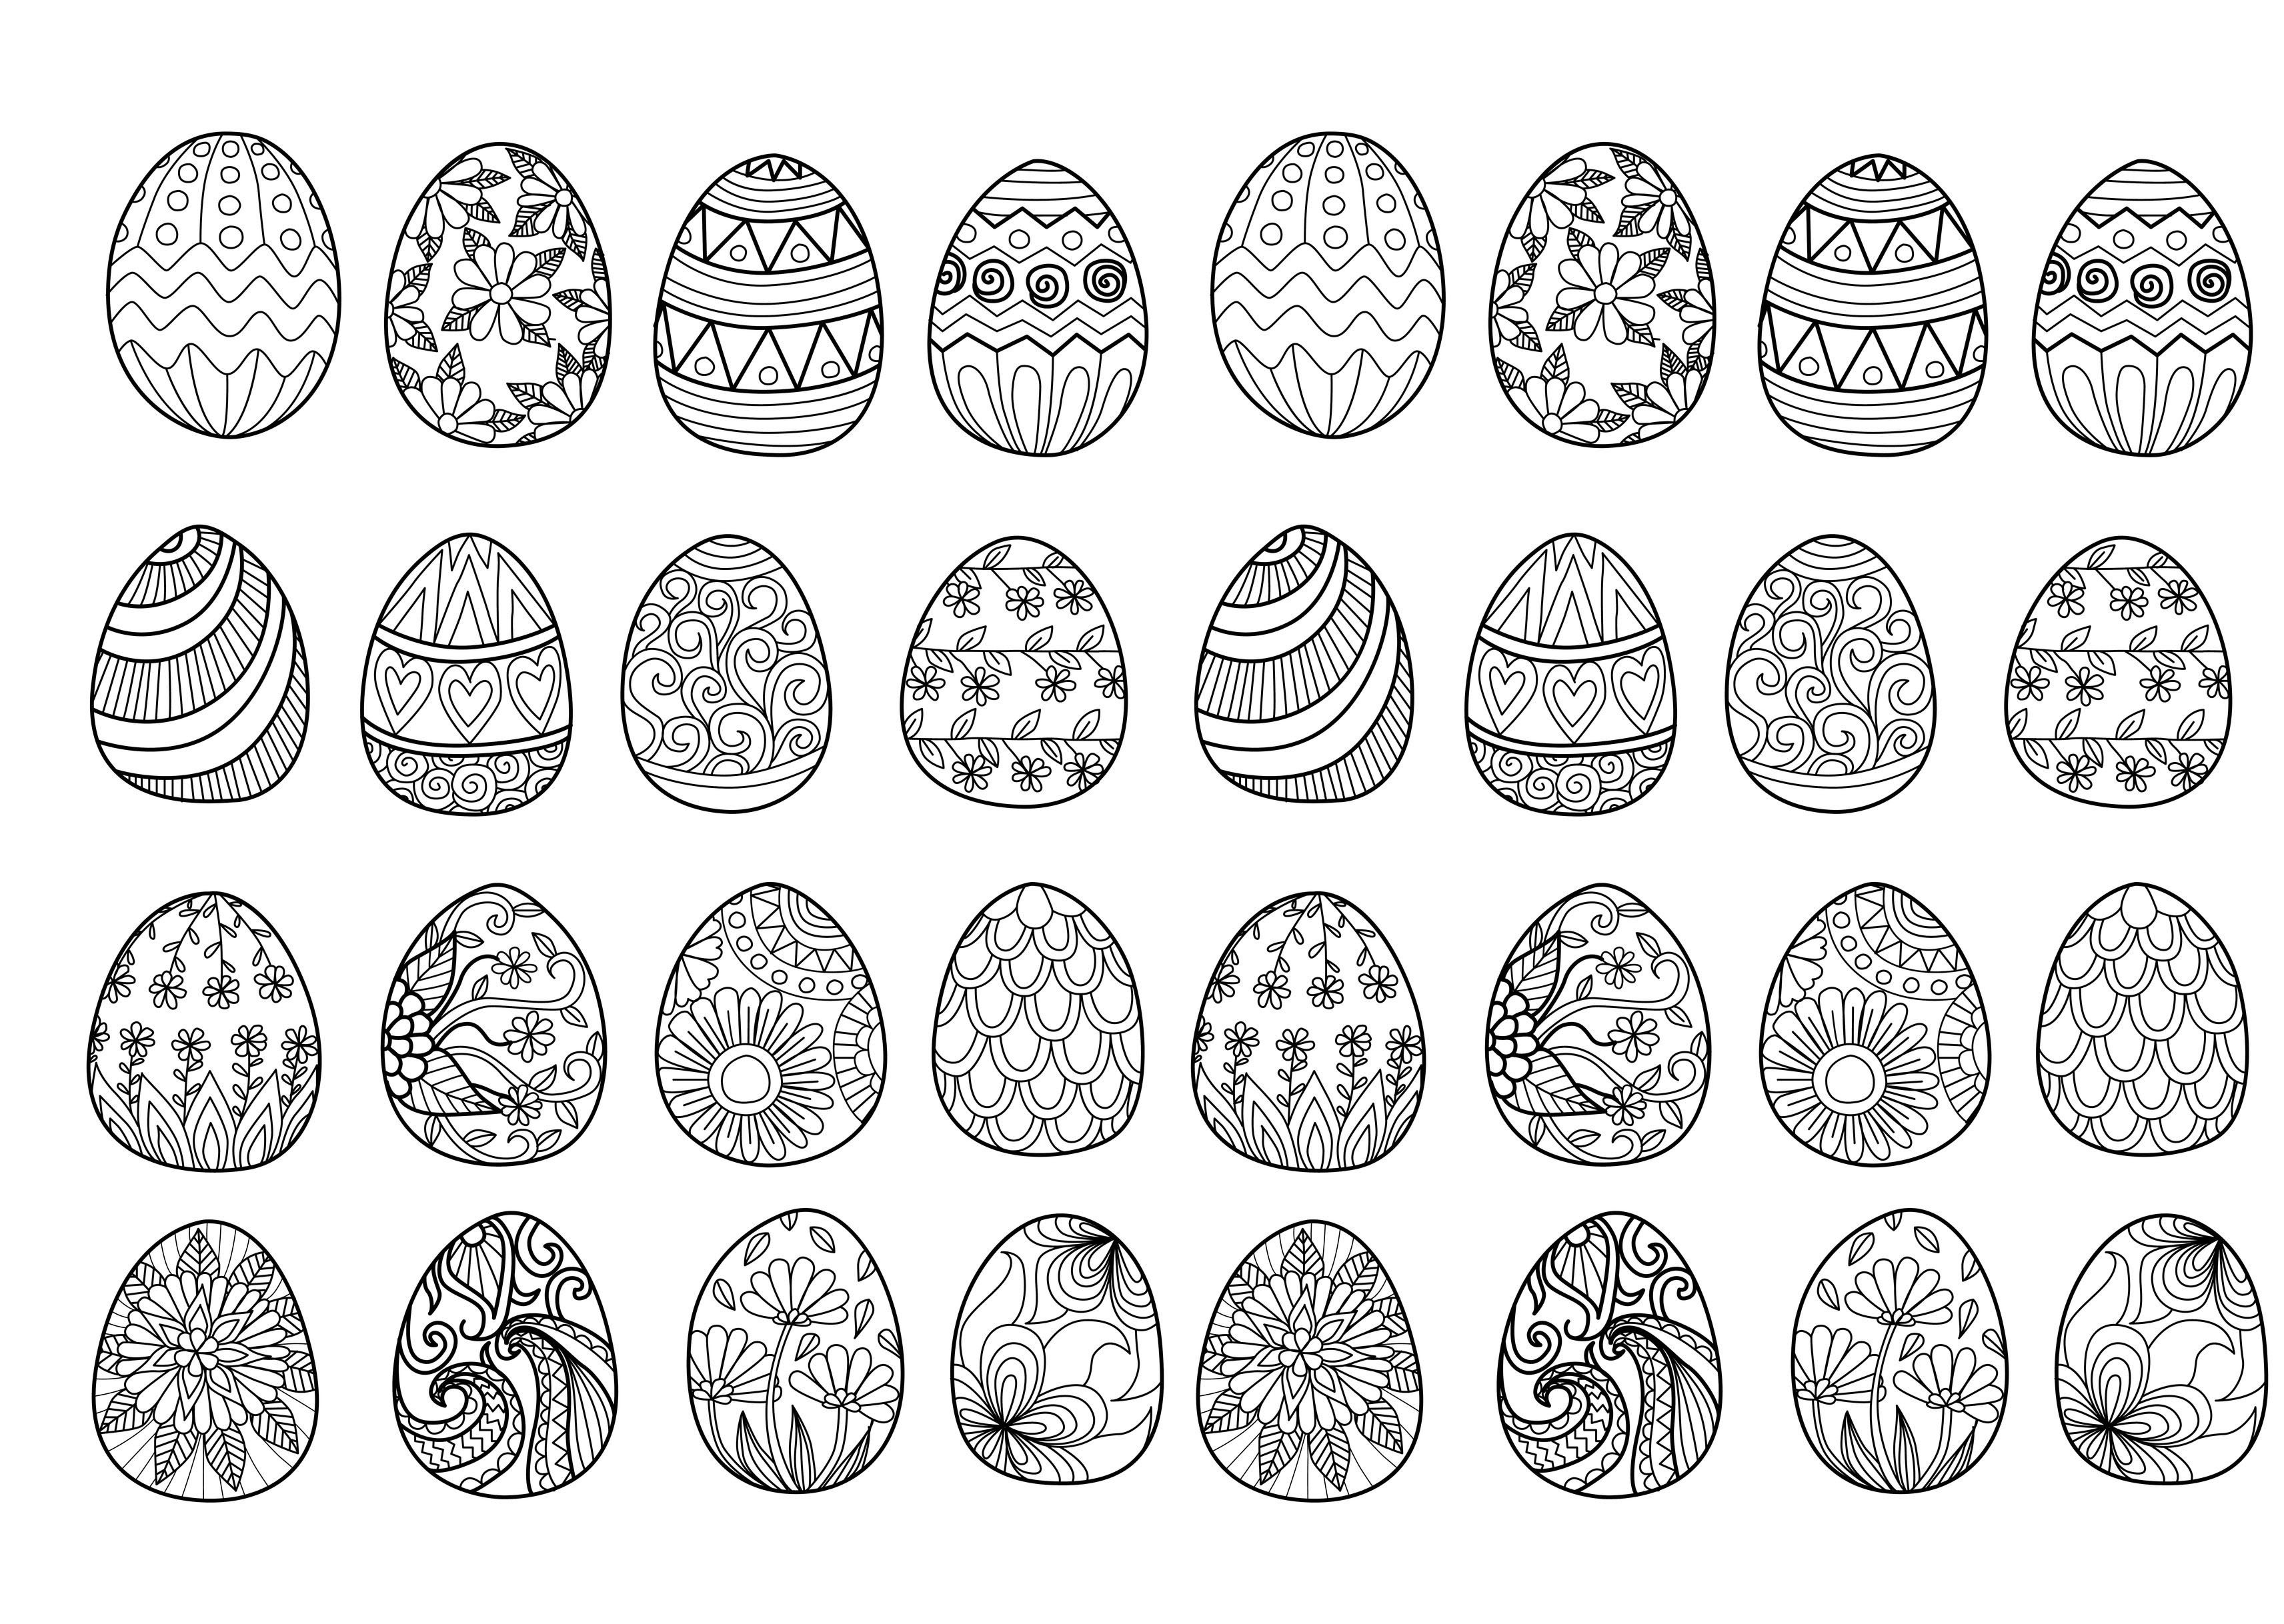 Ostern 73621 | Ostern - Malbuch Fur Erwachsene